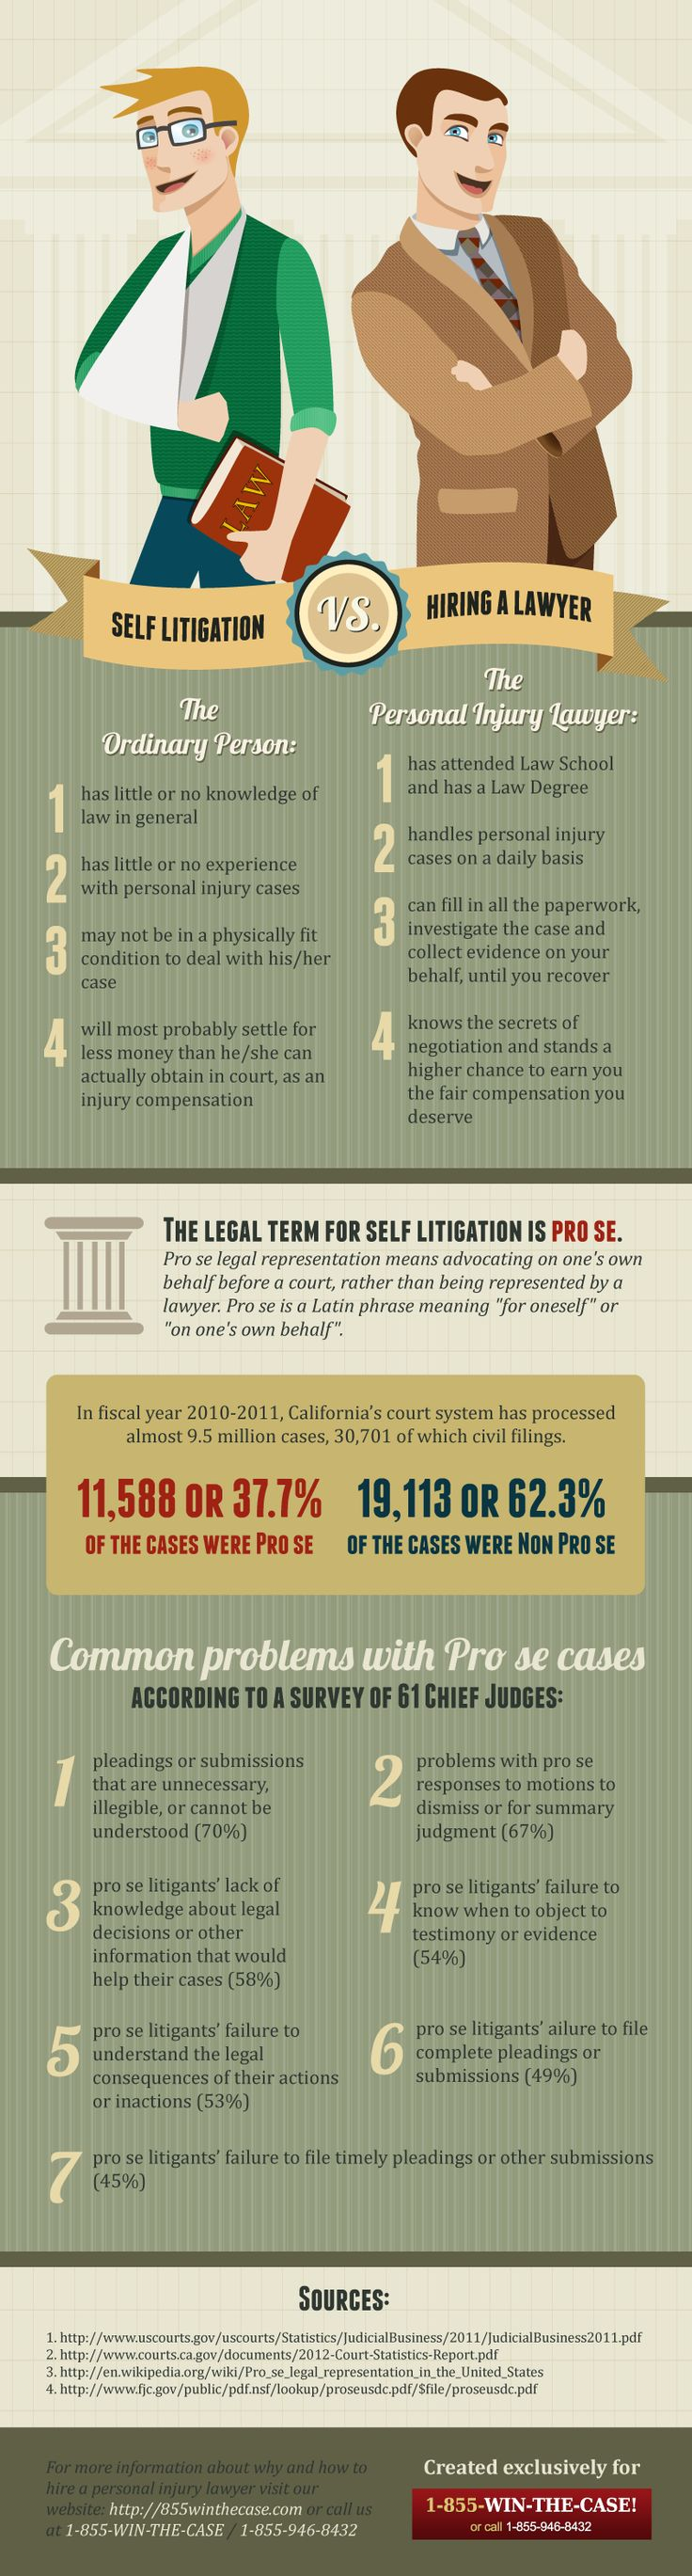 Self Litigation vs. Hiring a Lawyer Infographic